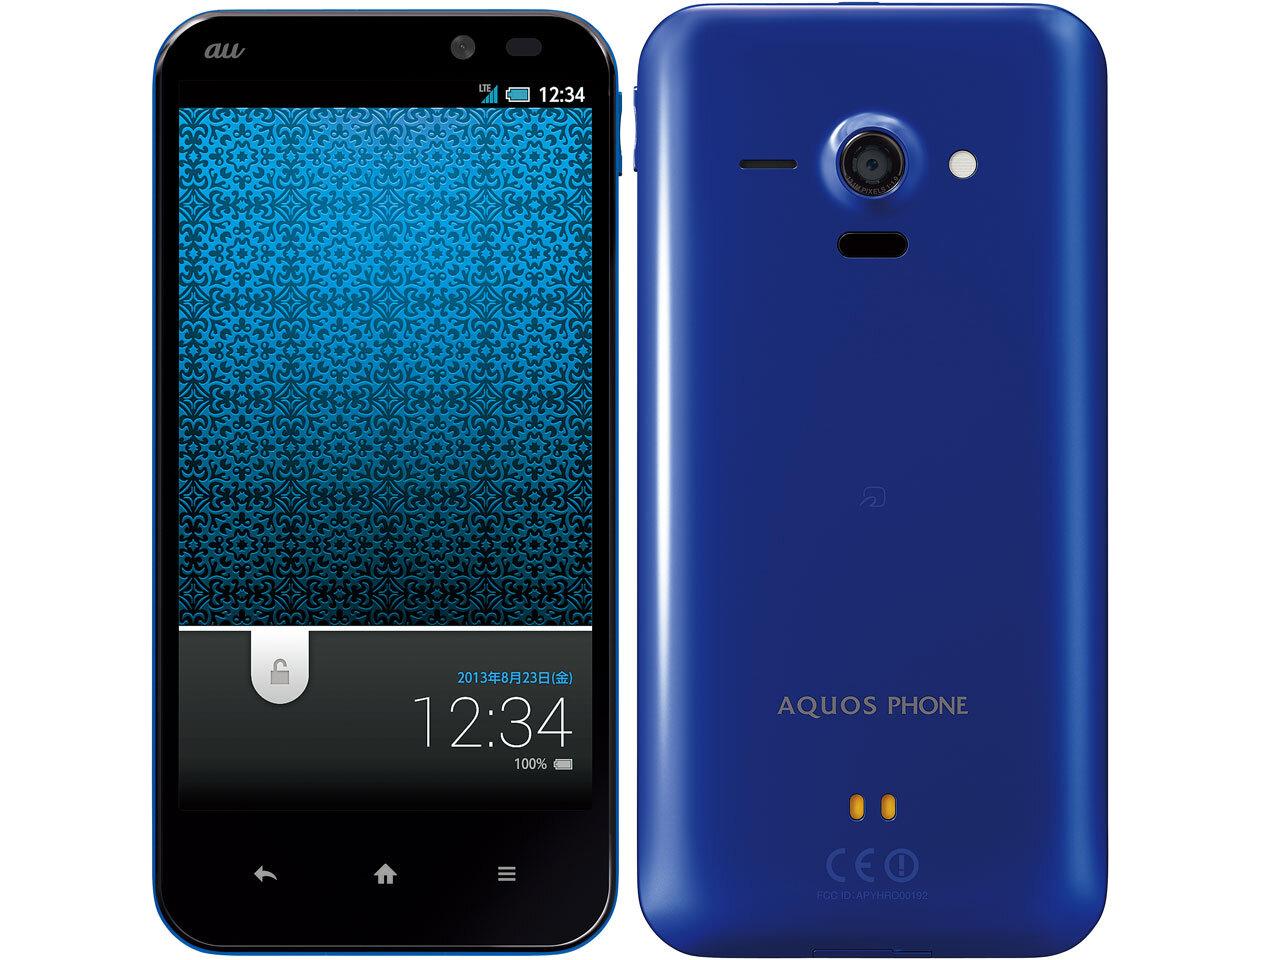 Au by KDDIから「AQUOS PHONE SERIE SHL22」が登場!スペックや価格・発売日情報